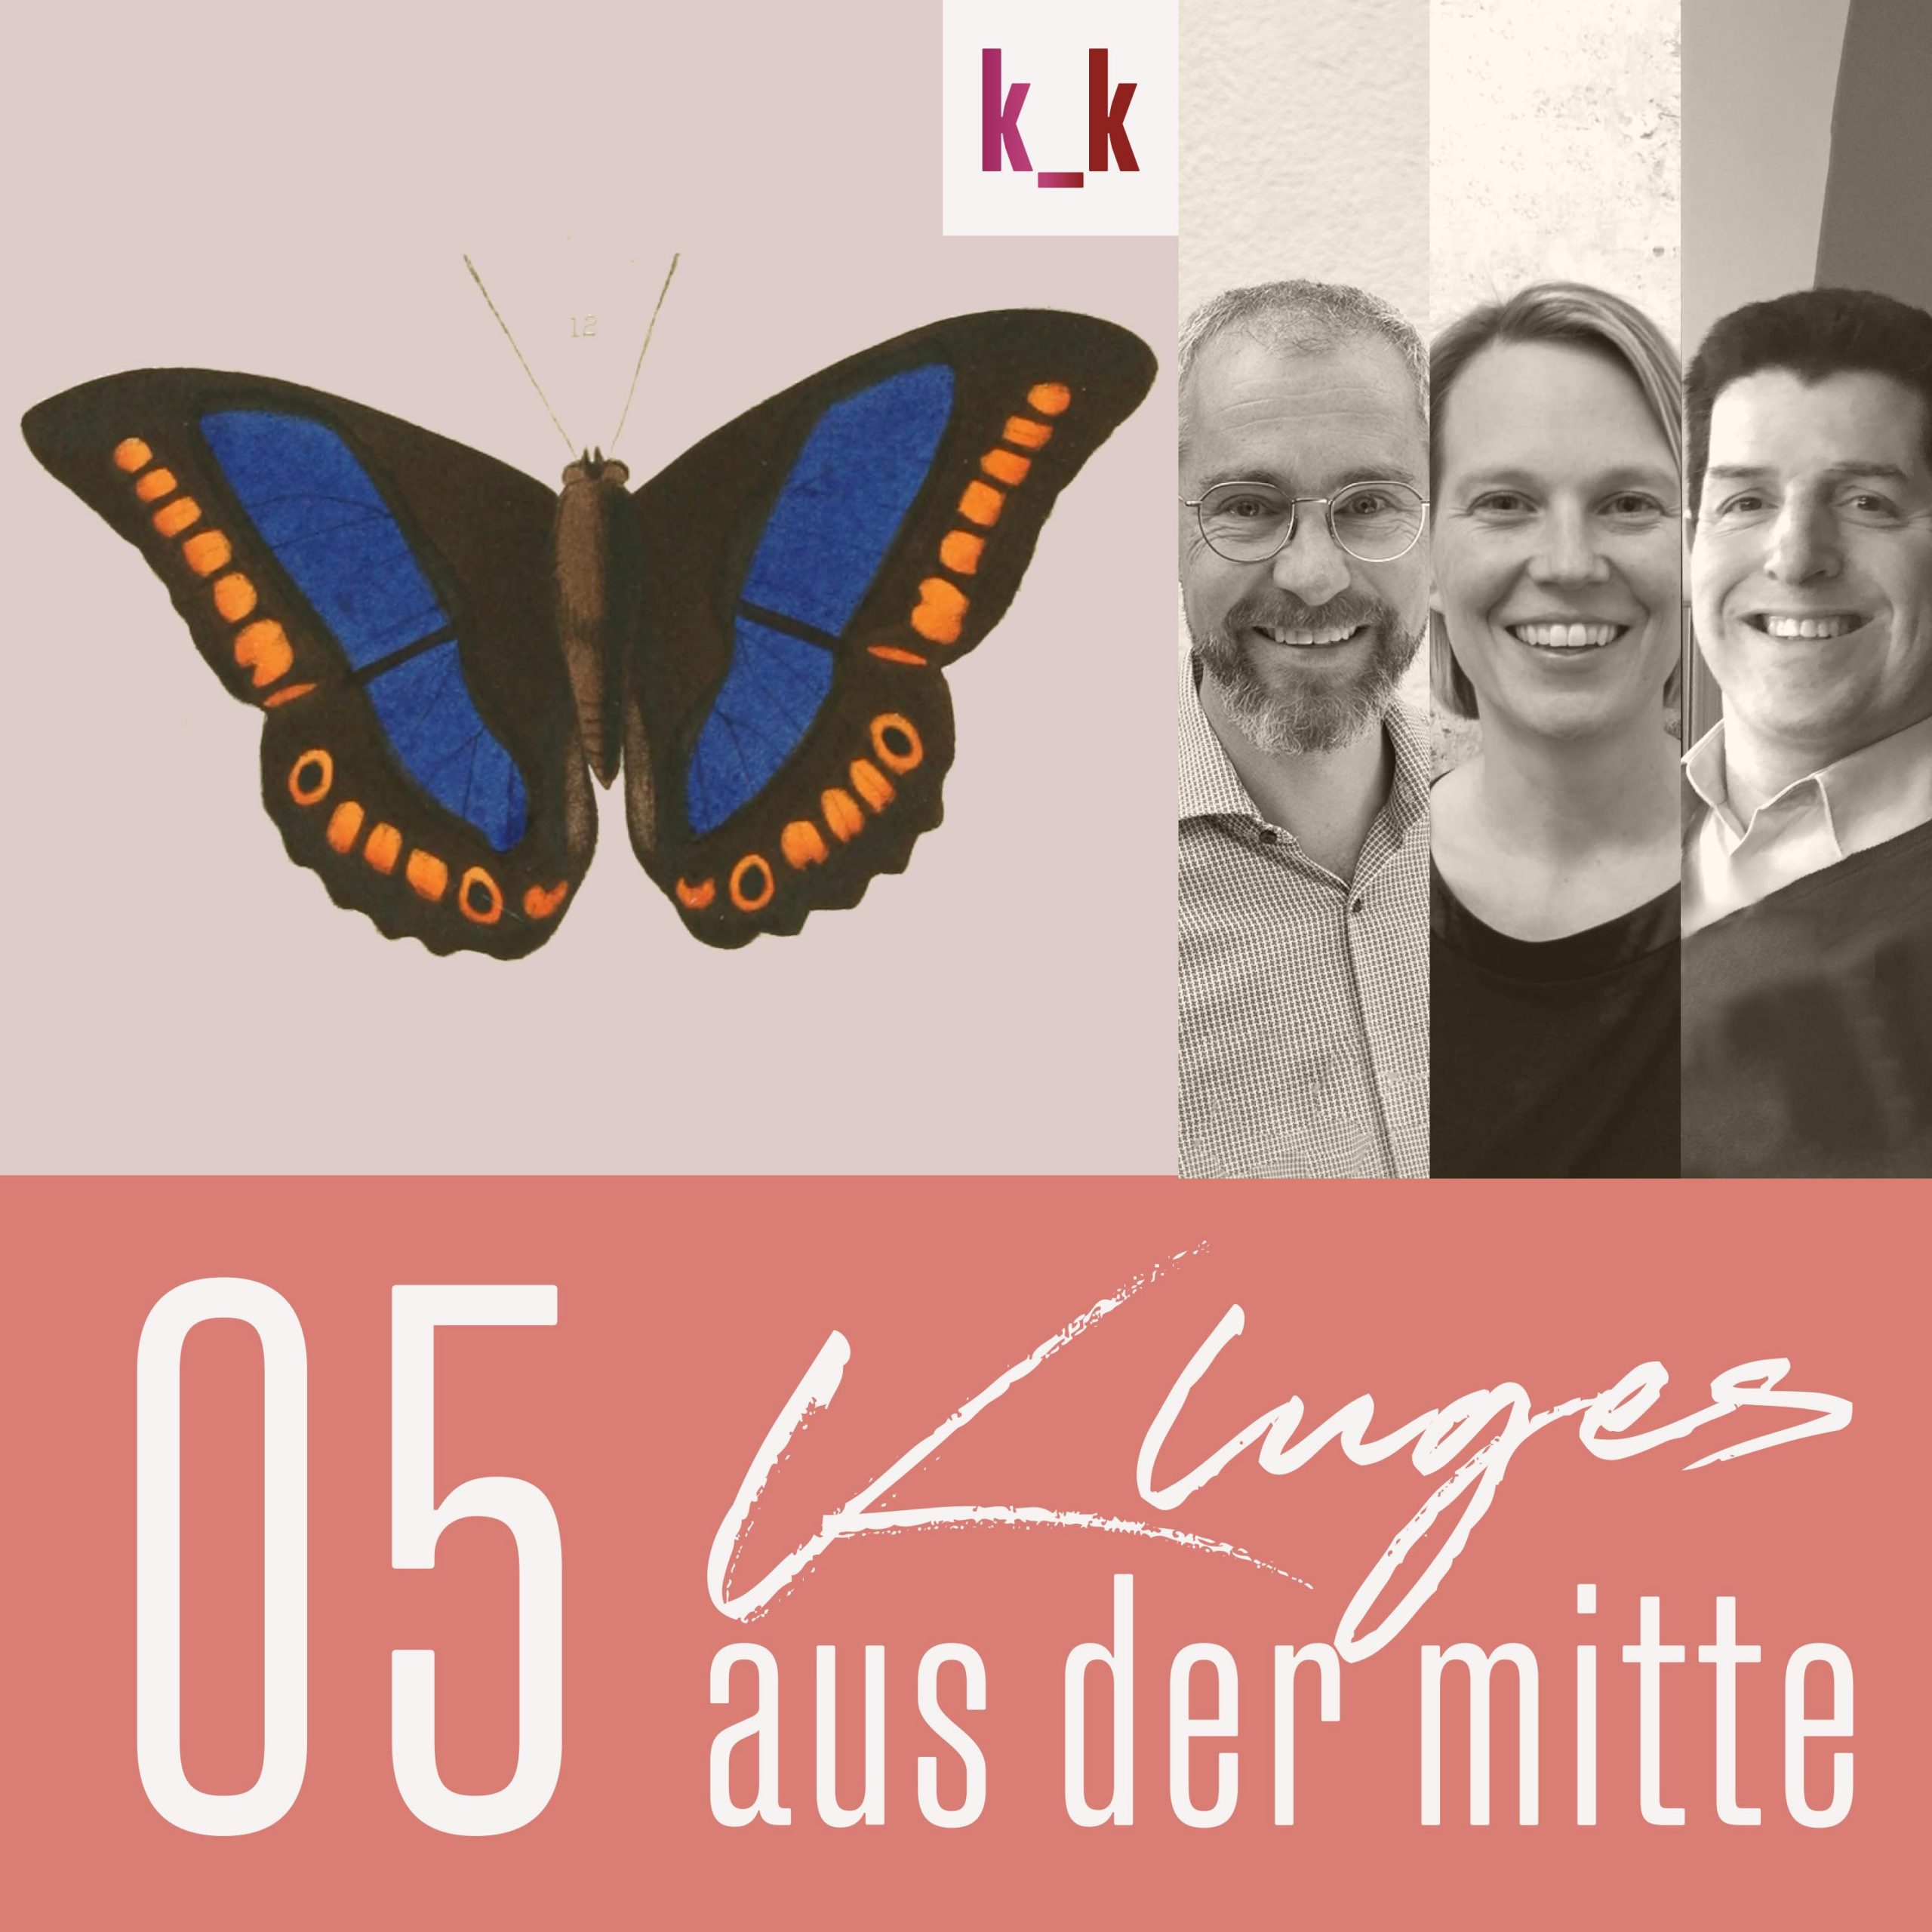 Thumbnail of https://www.kluge-konsorten.de/05-i-have-seen-another-mushroom/